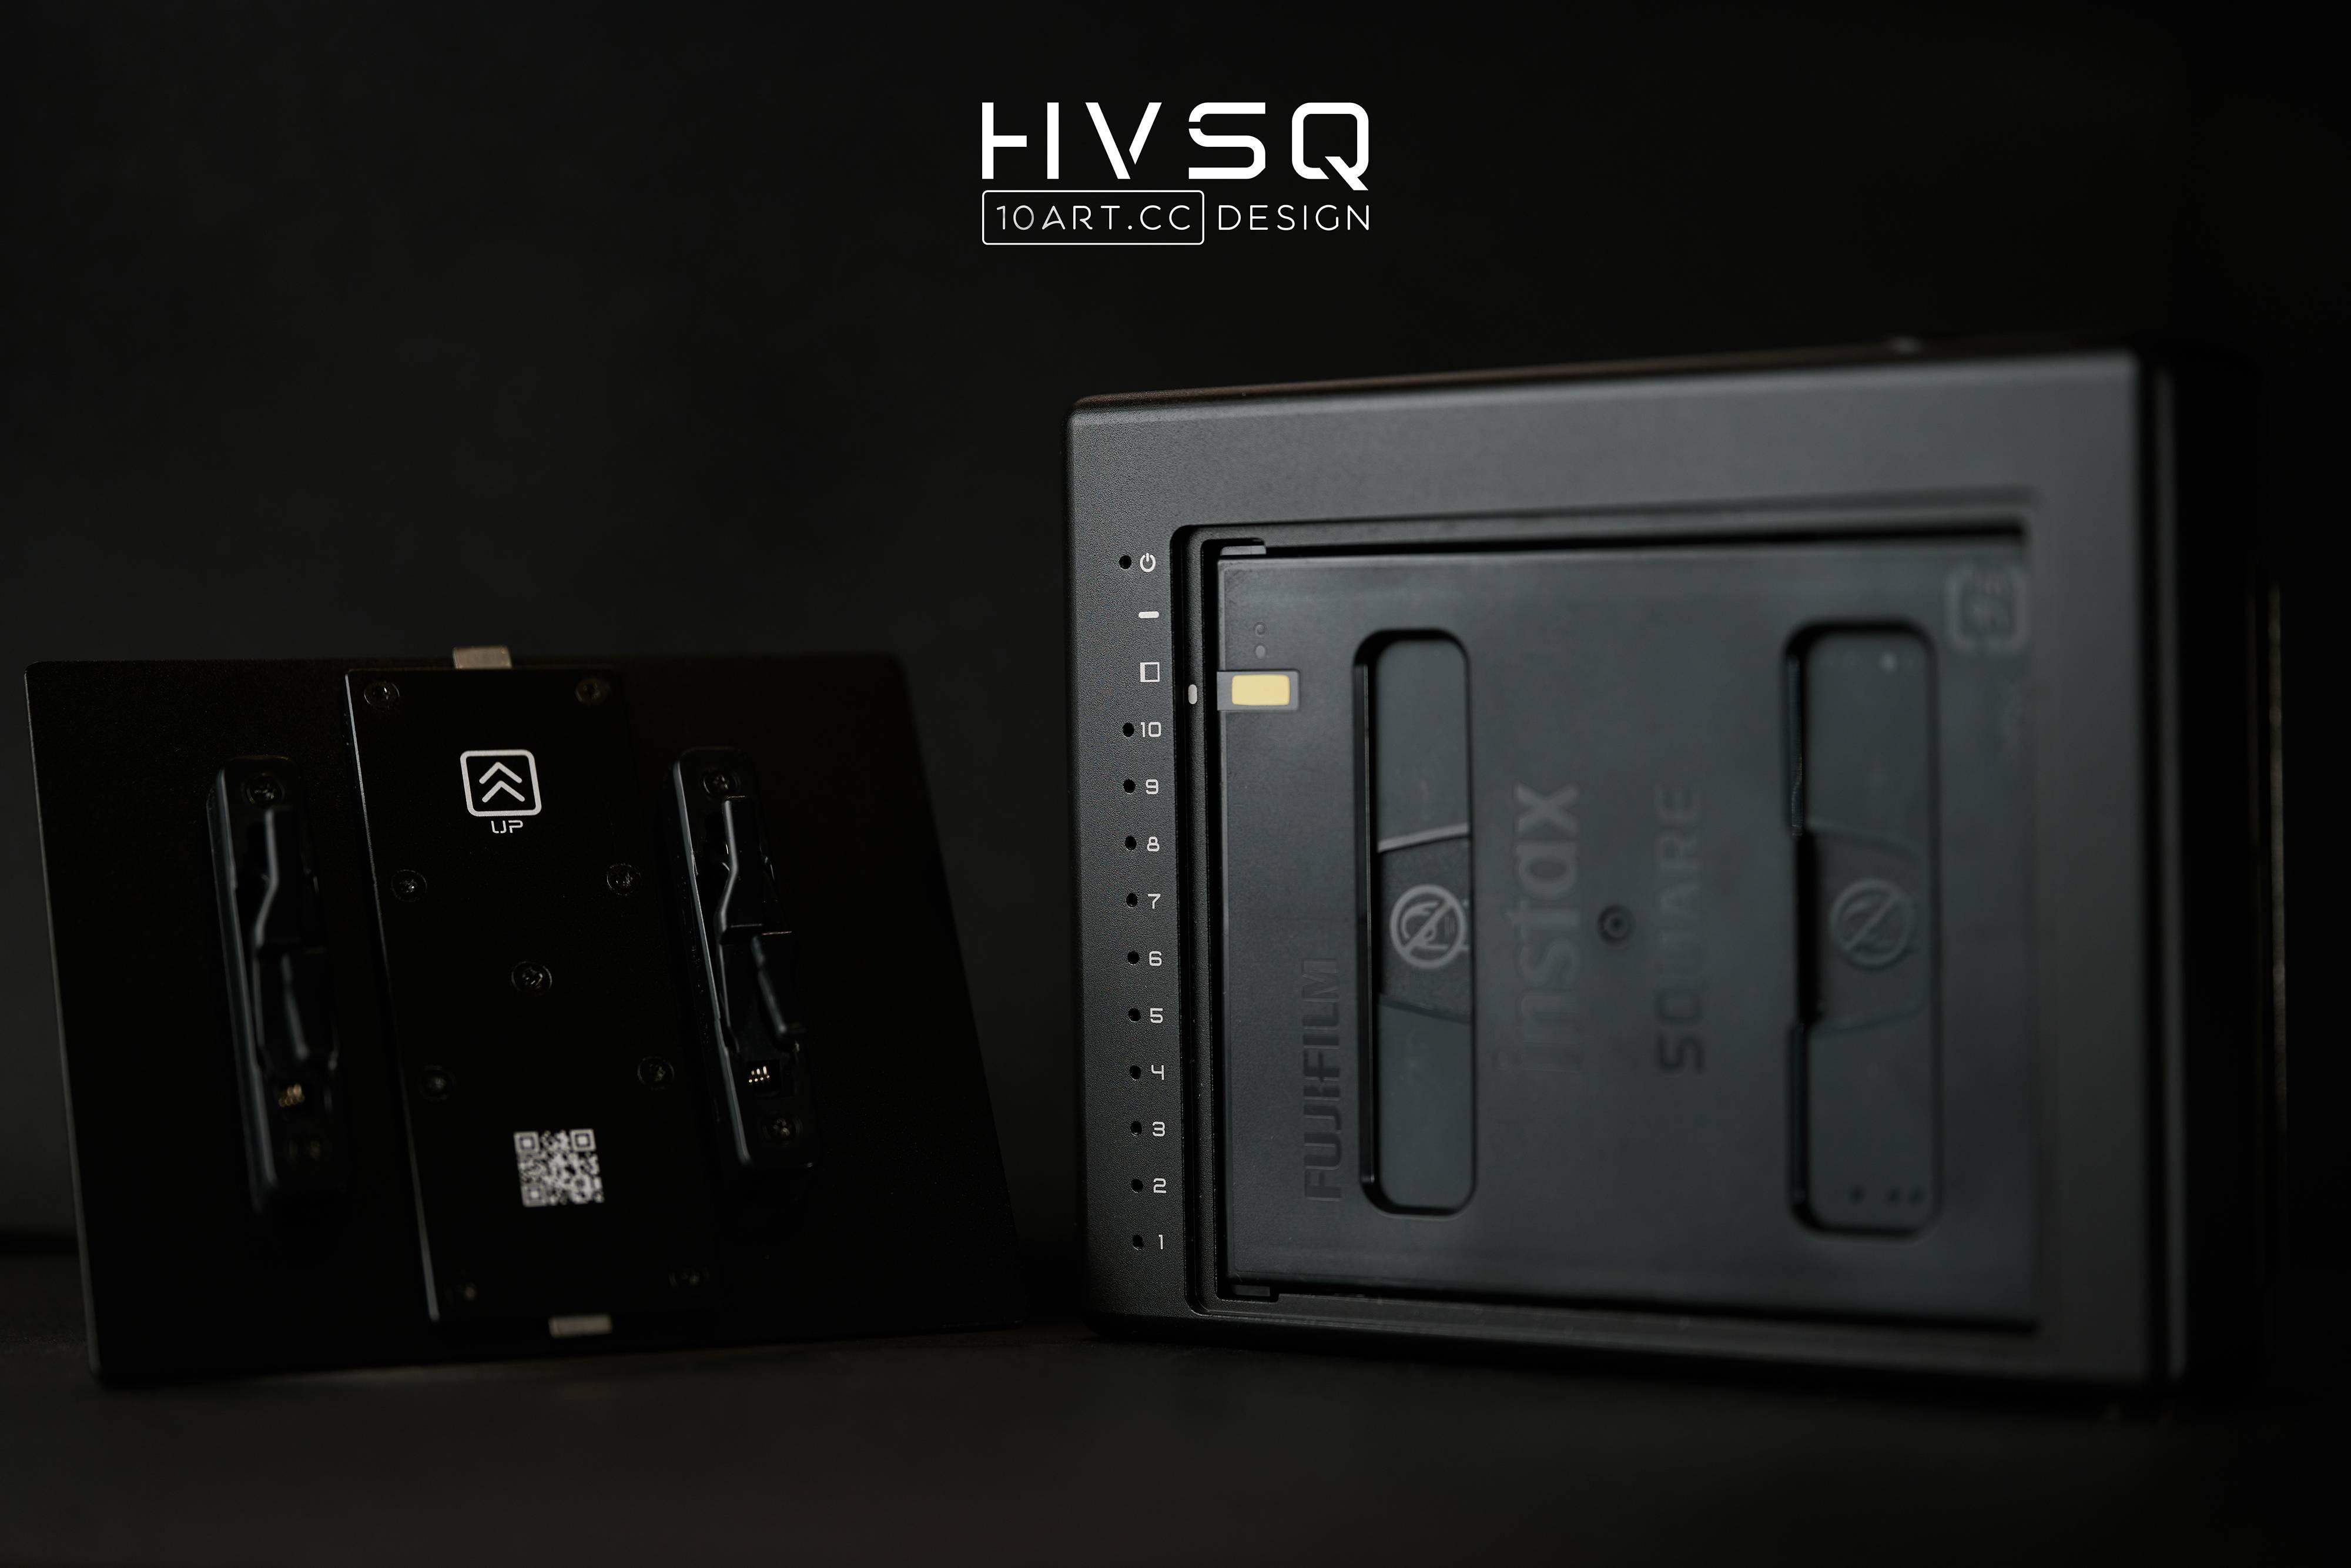 HVSQ Ver.2 Officially Released-10ARTCC